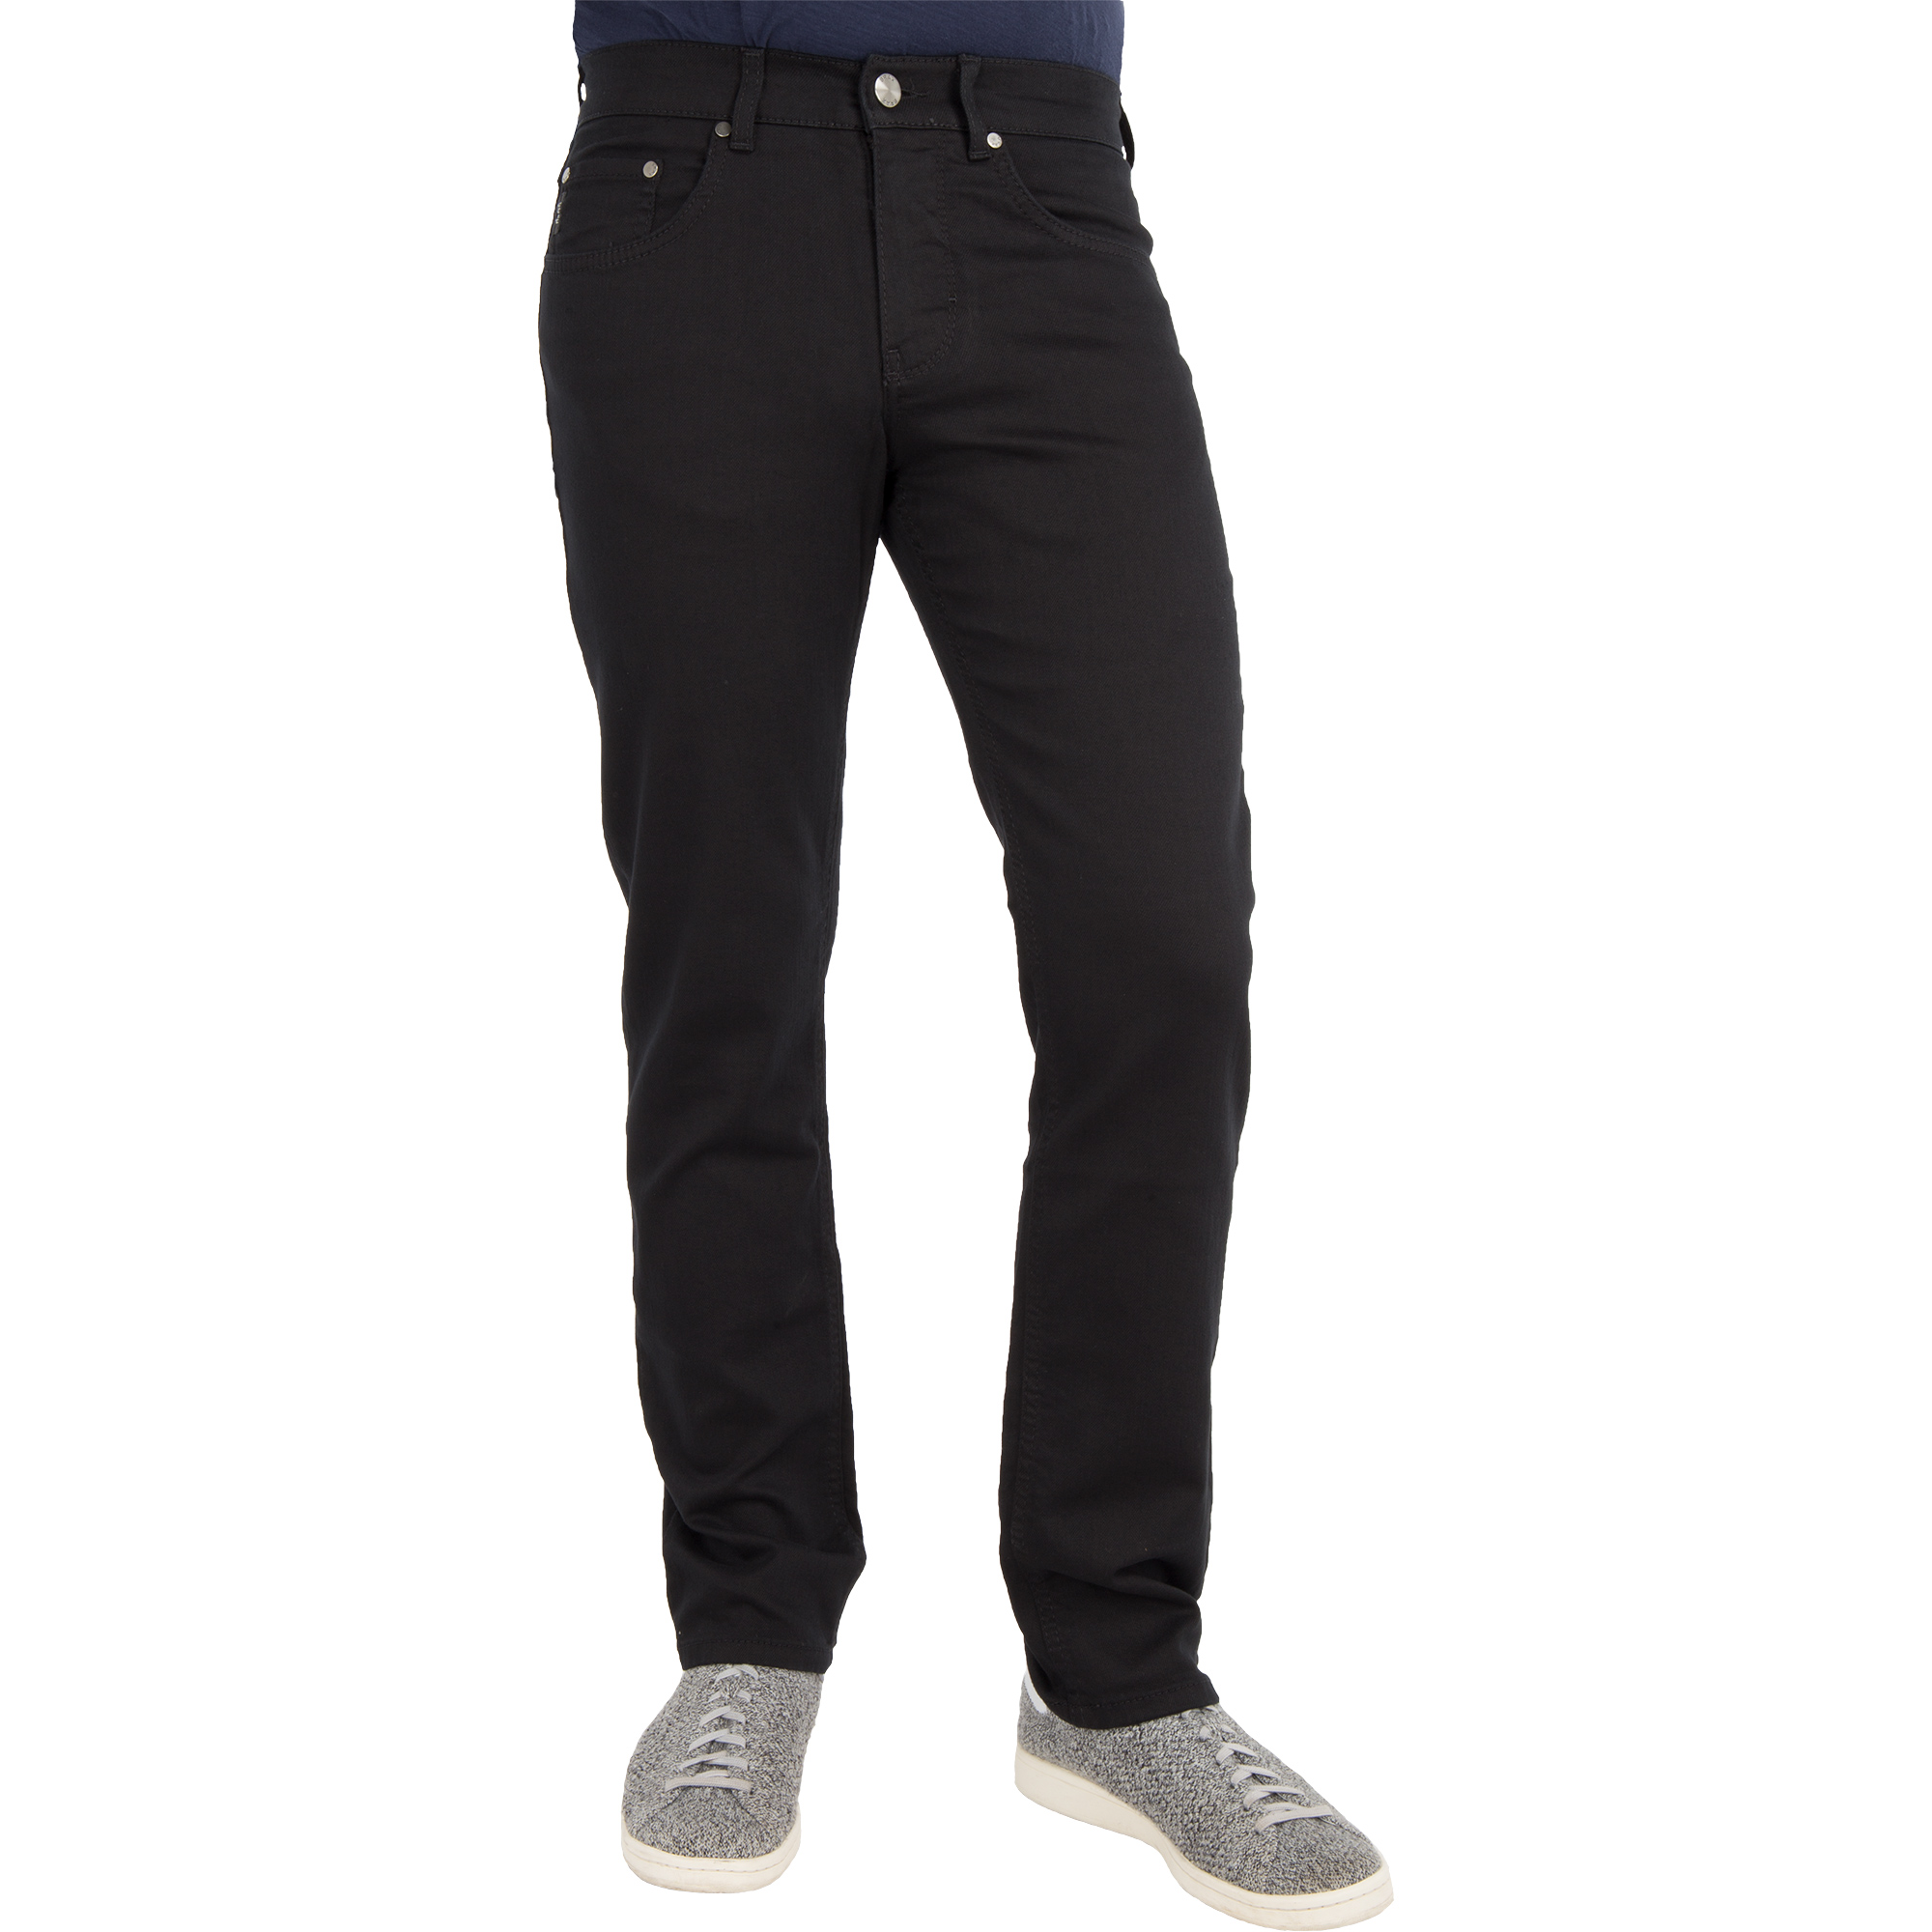 brax herren jeans cooper denim regular fit perma black brax leineweber online kaufen. Black Bedroom Furniture Sets. Home Design Ideas